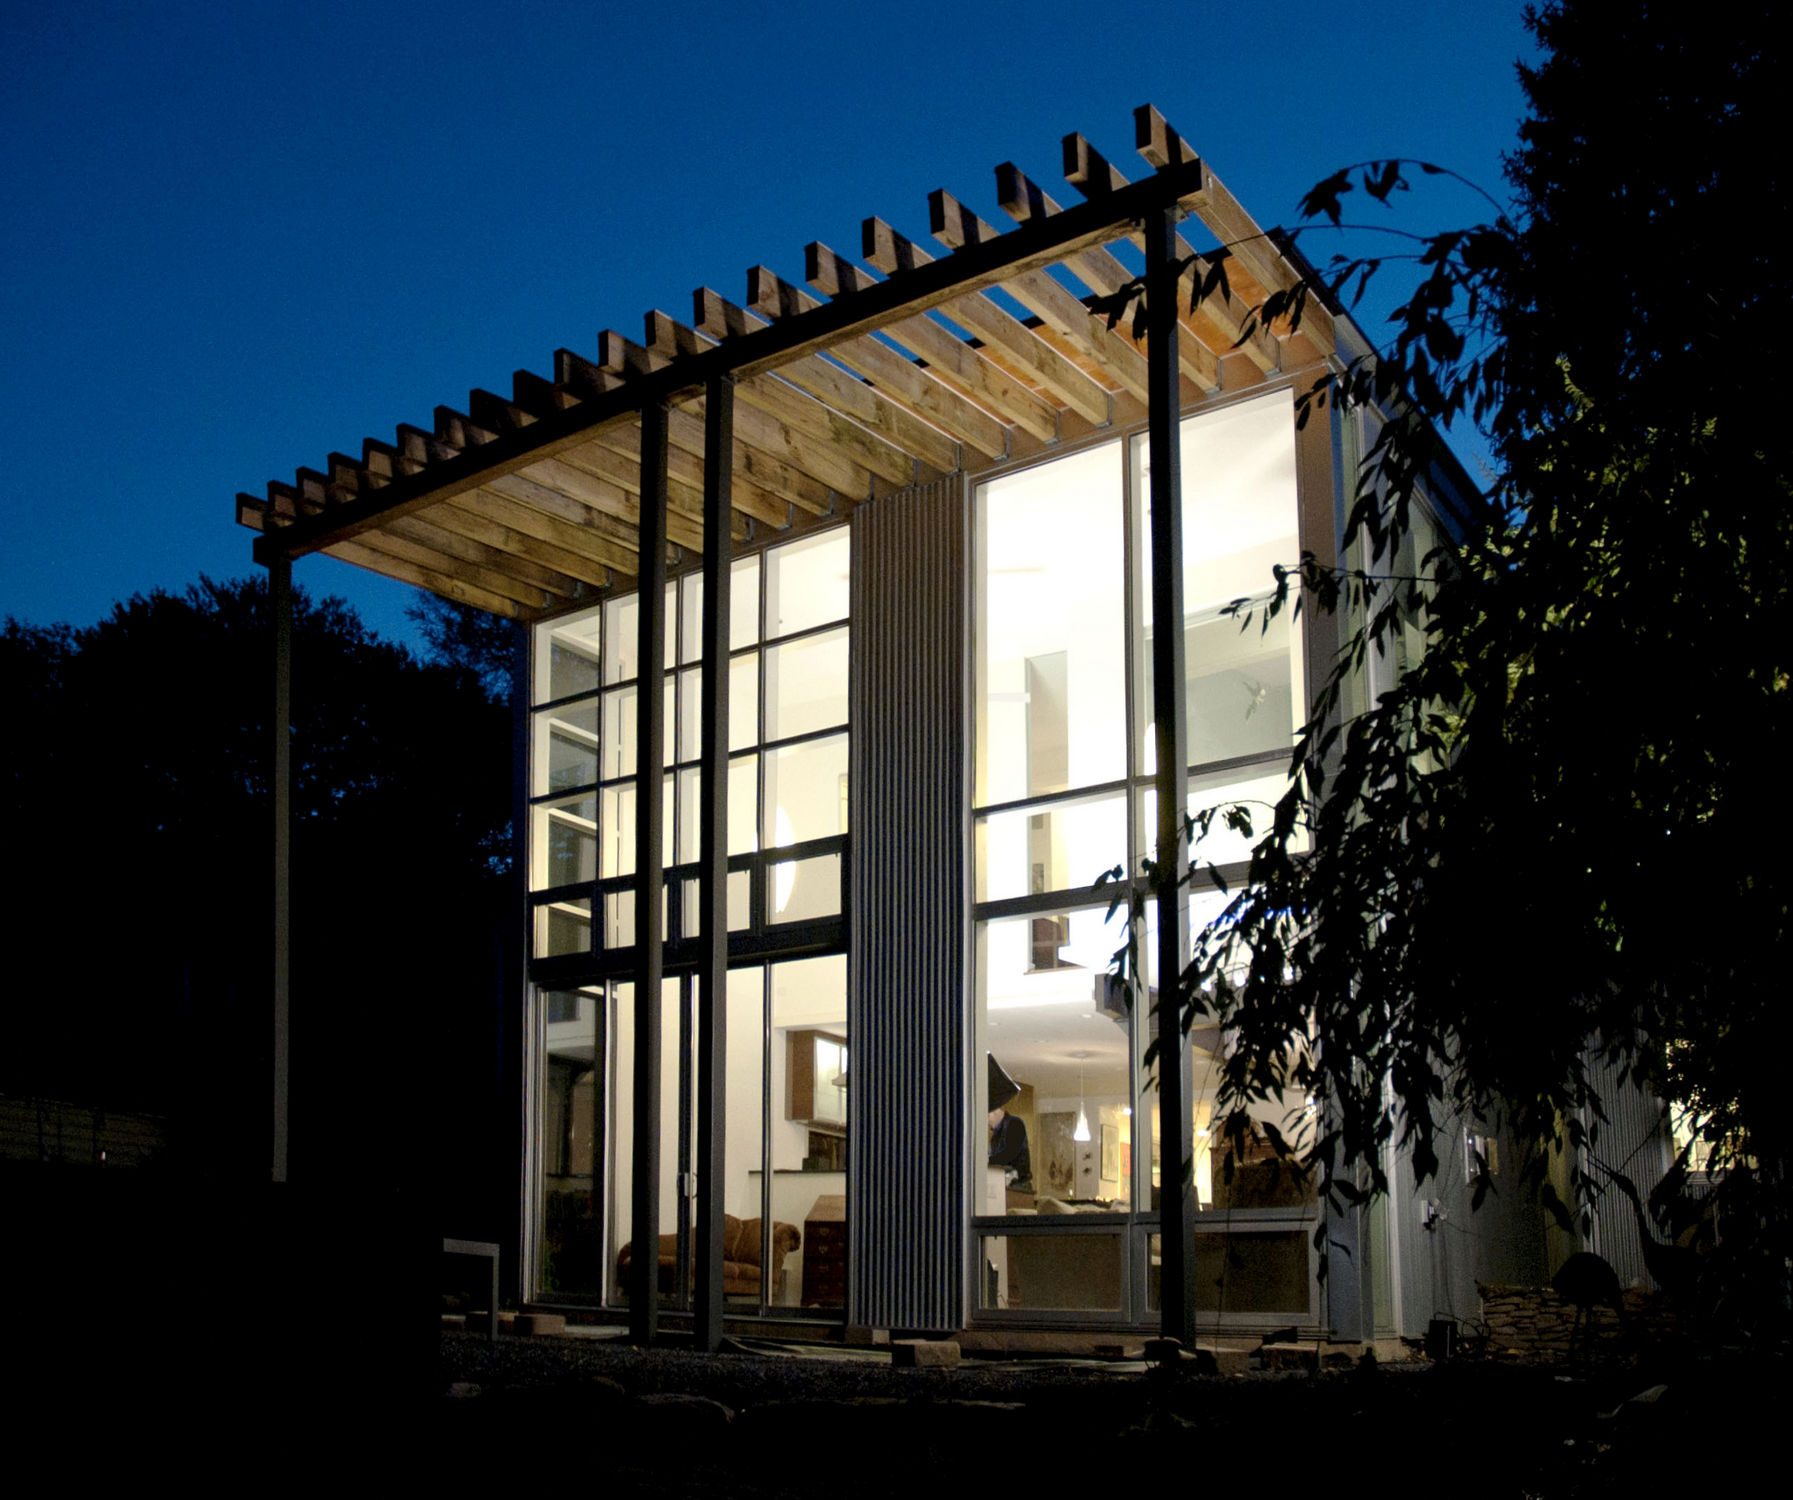 Residential Exterior Glass Wall Systems justsingitcom